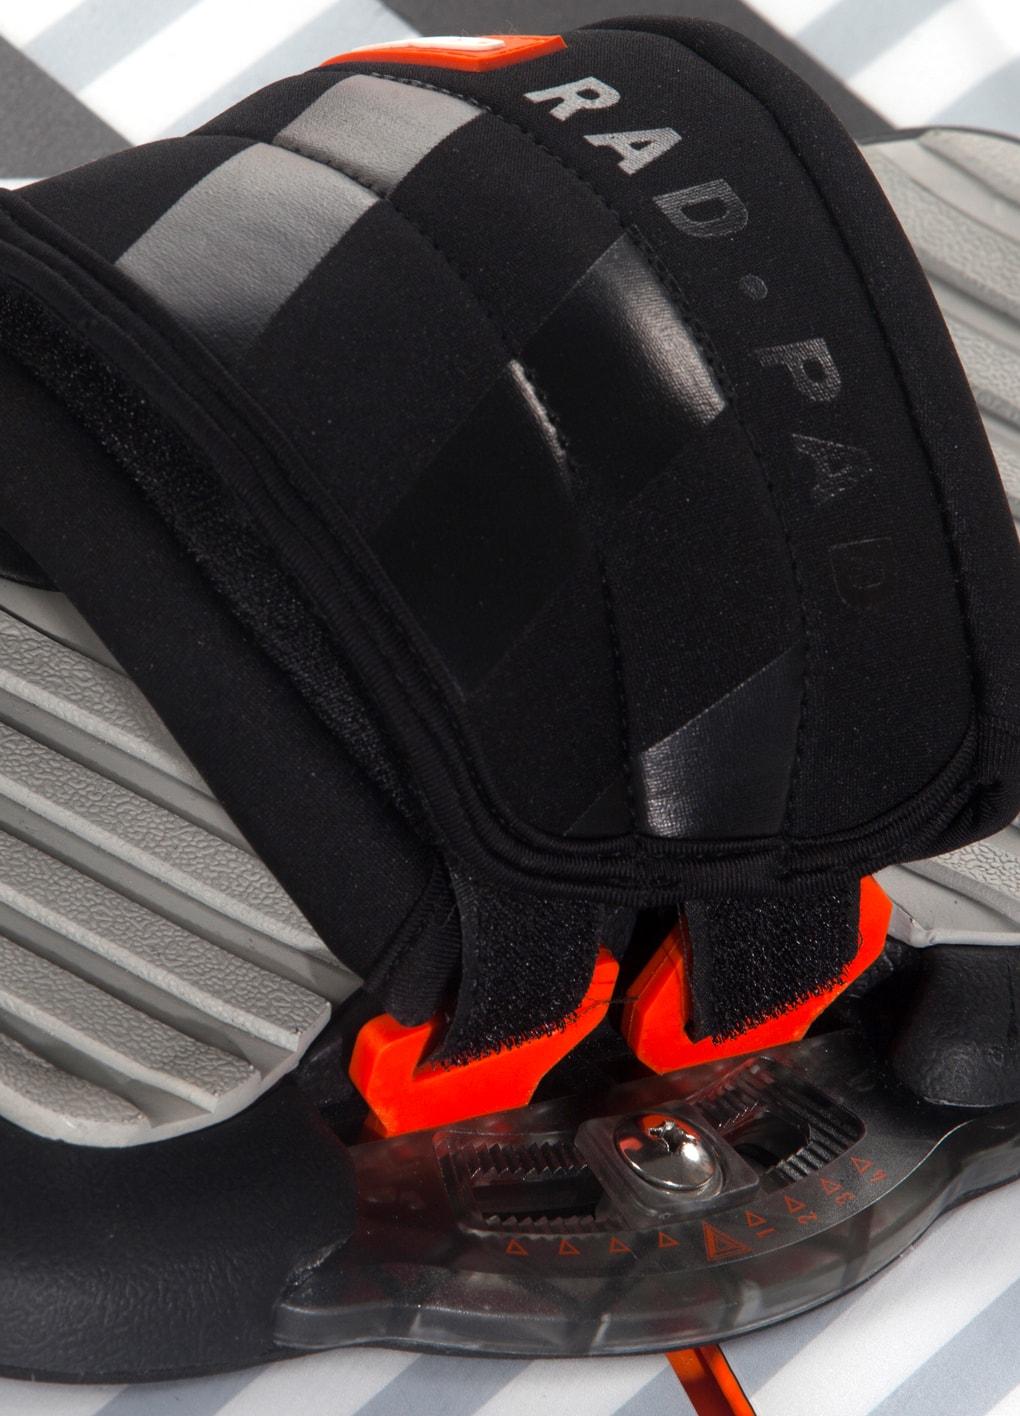 rrd-kite-pads-detail-stretch-y25